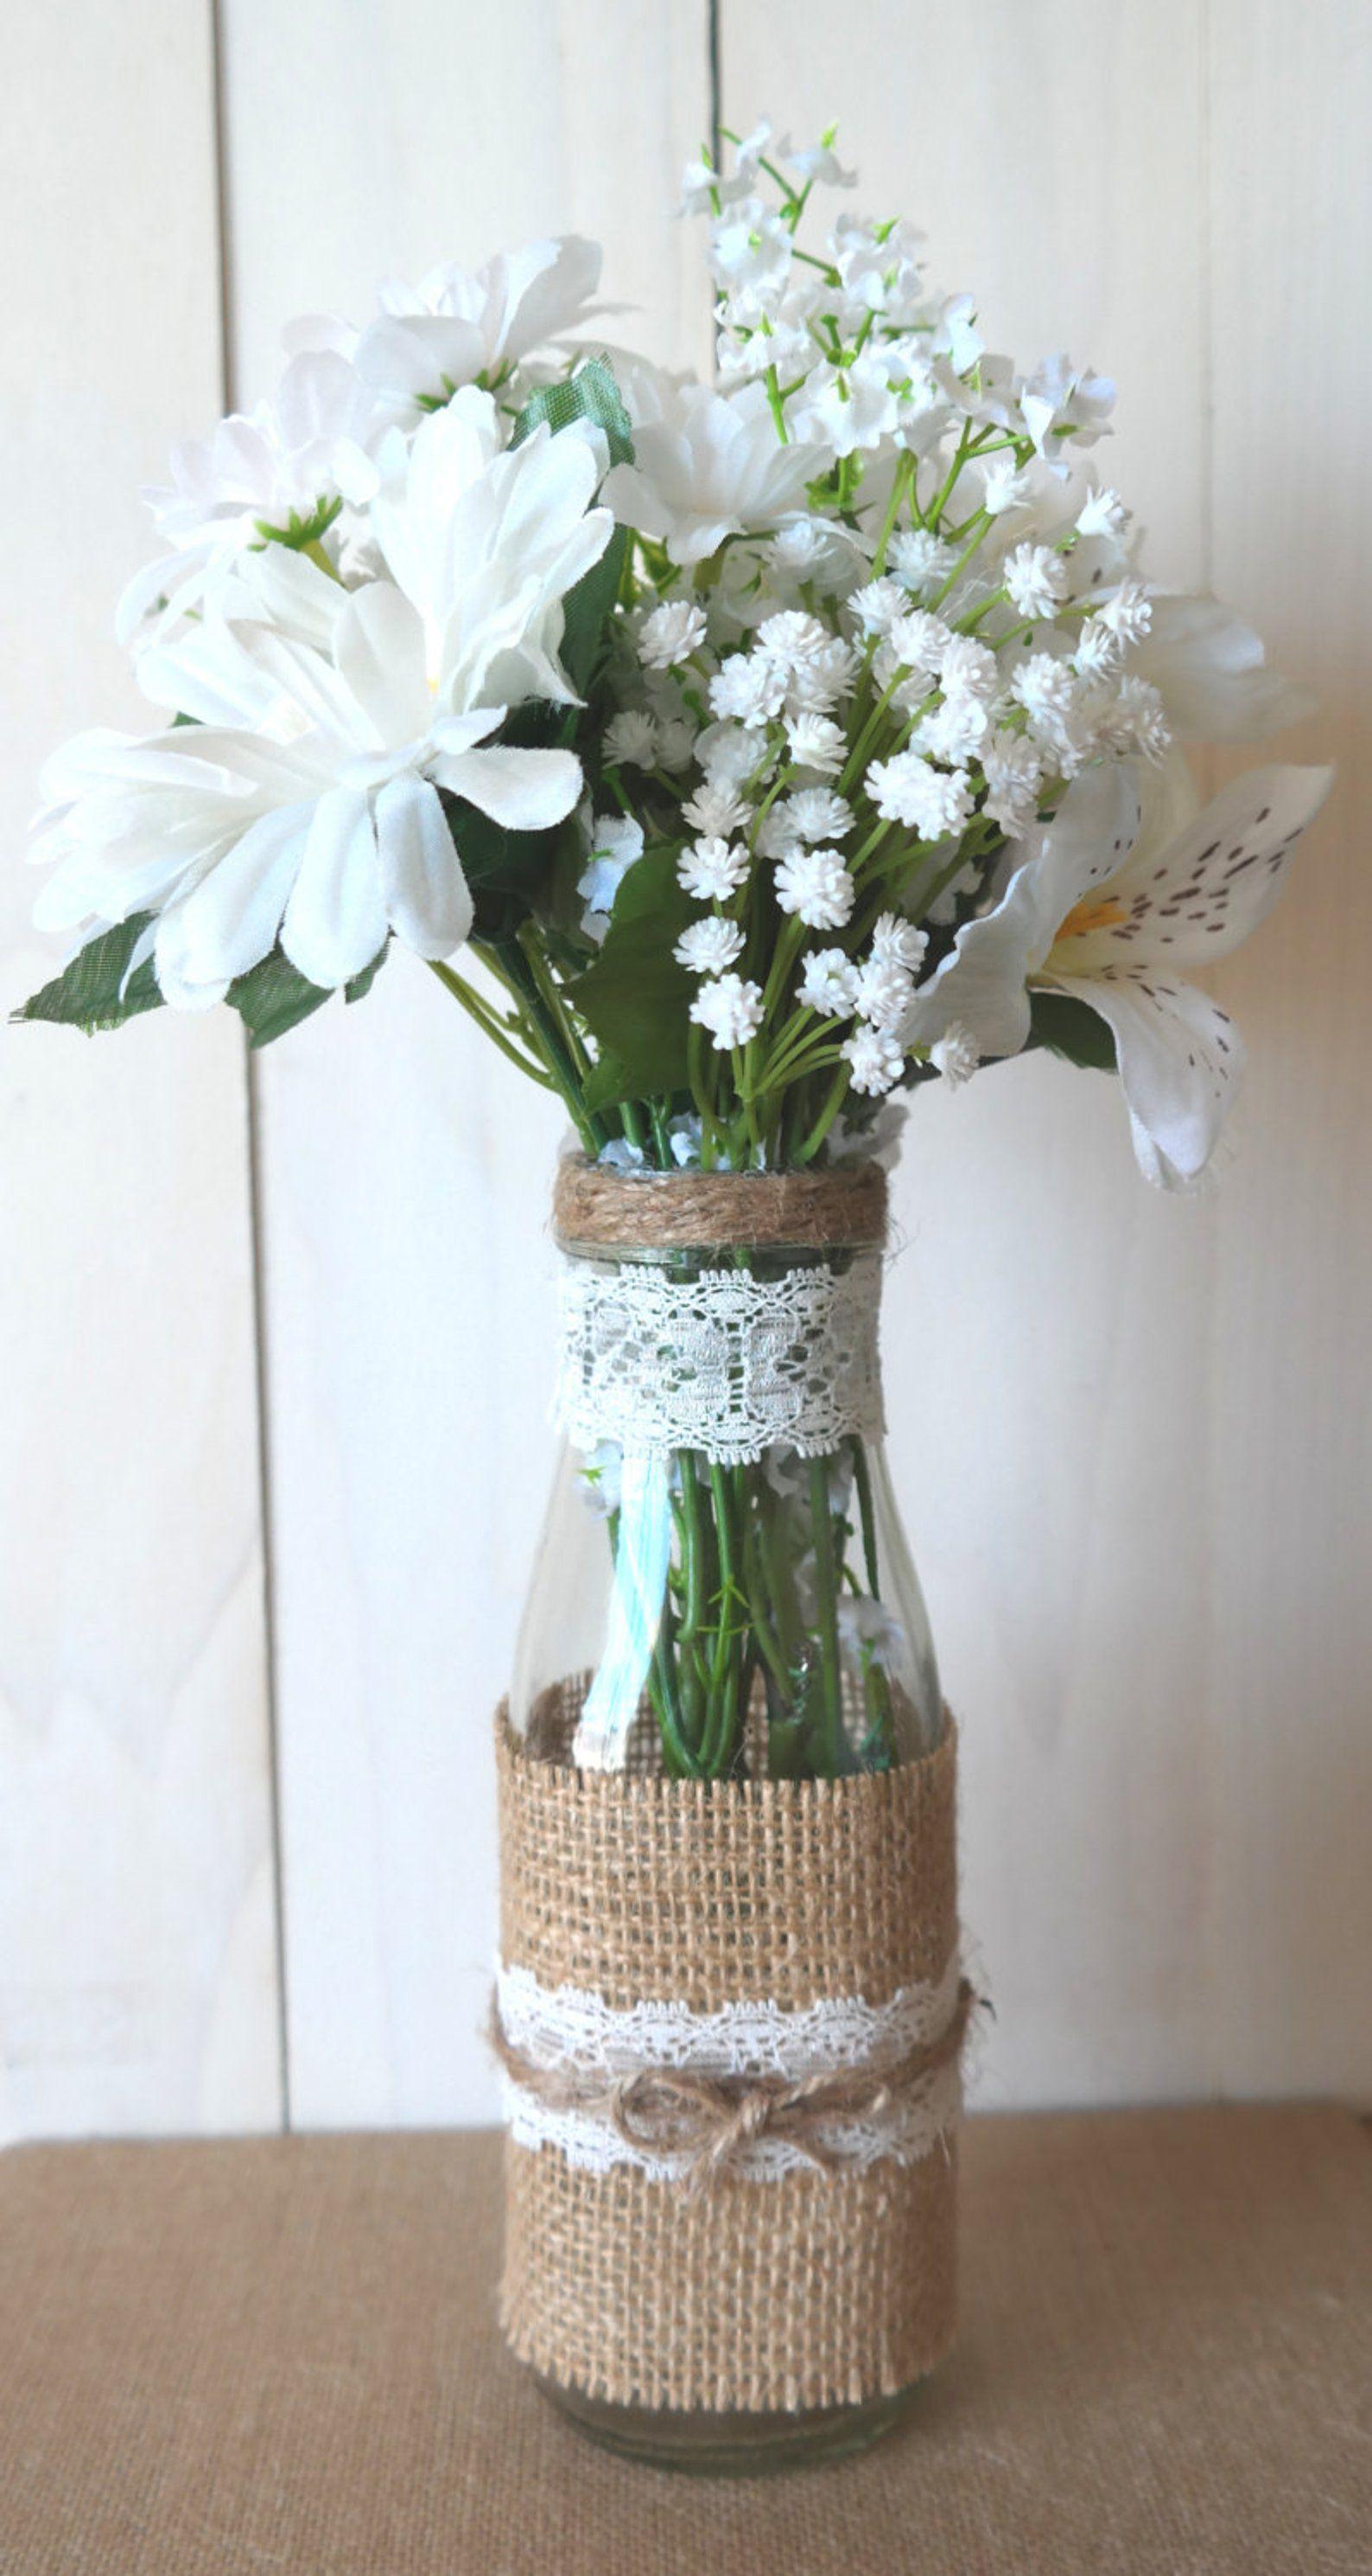 Rustic Burlap and Lace Glass Bottle Vase Wedding Centerpiece